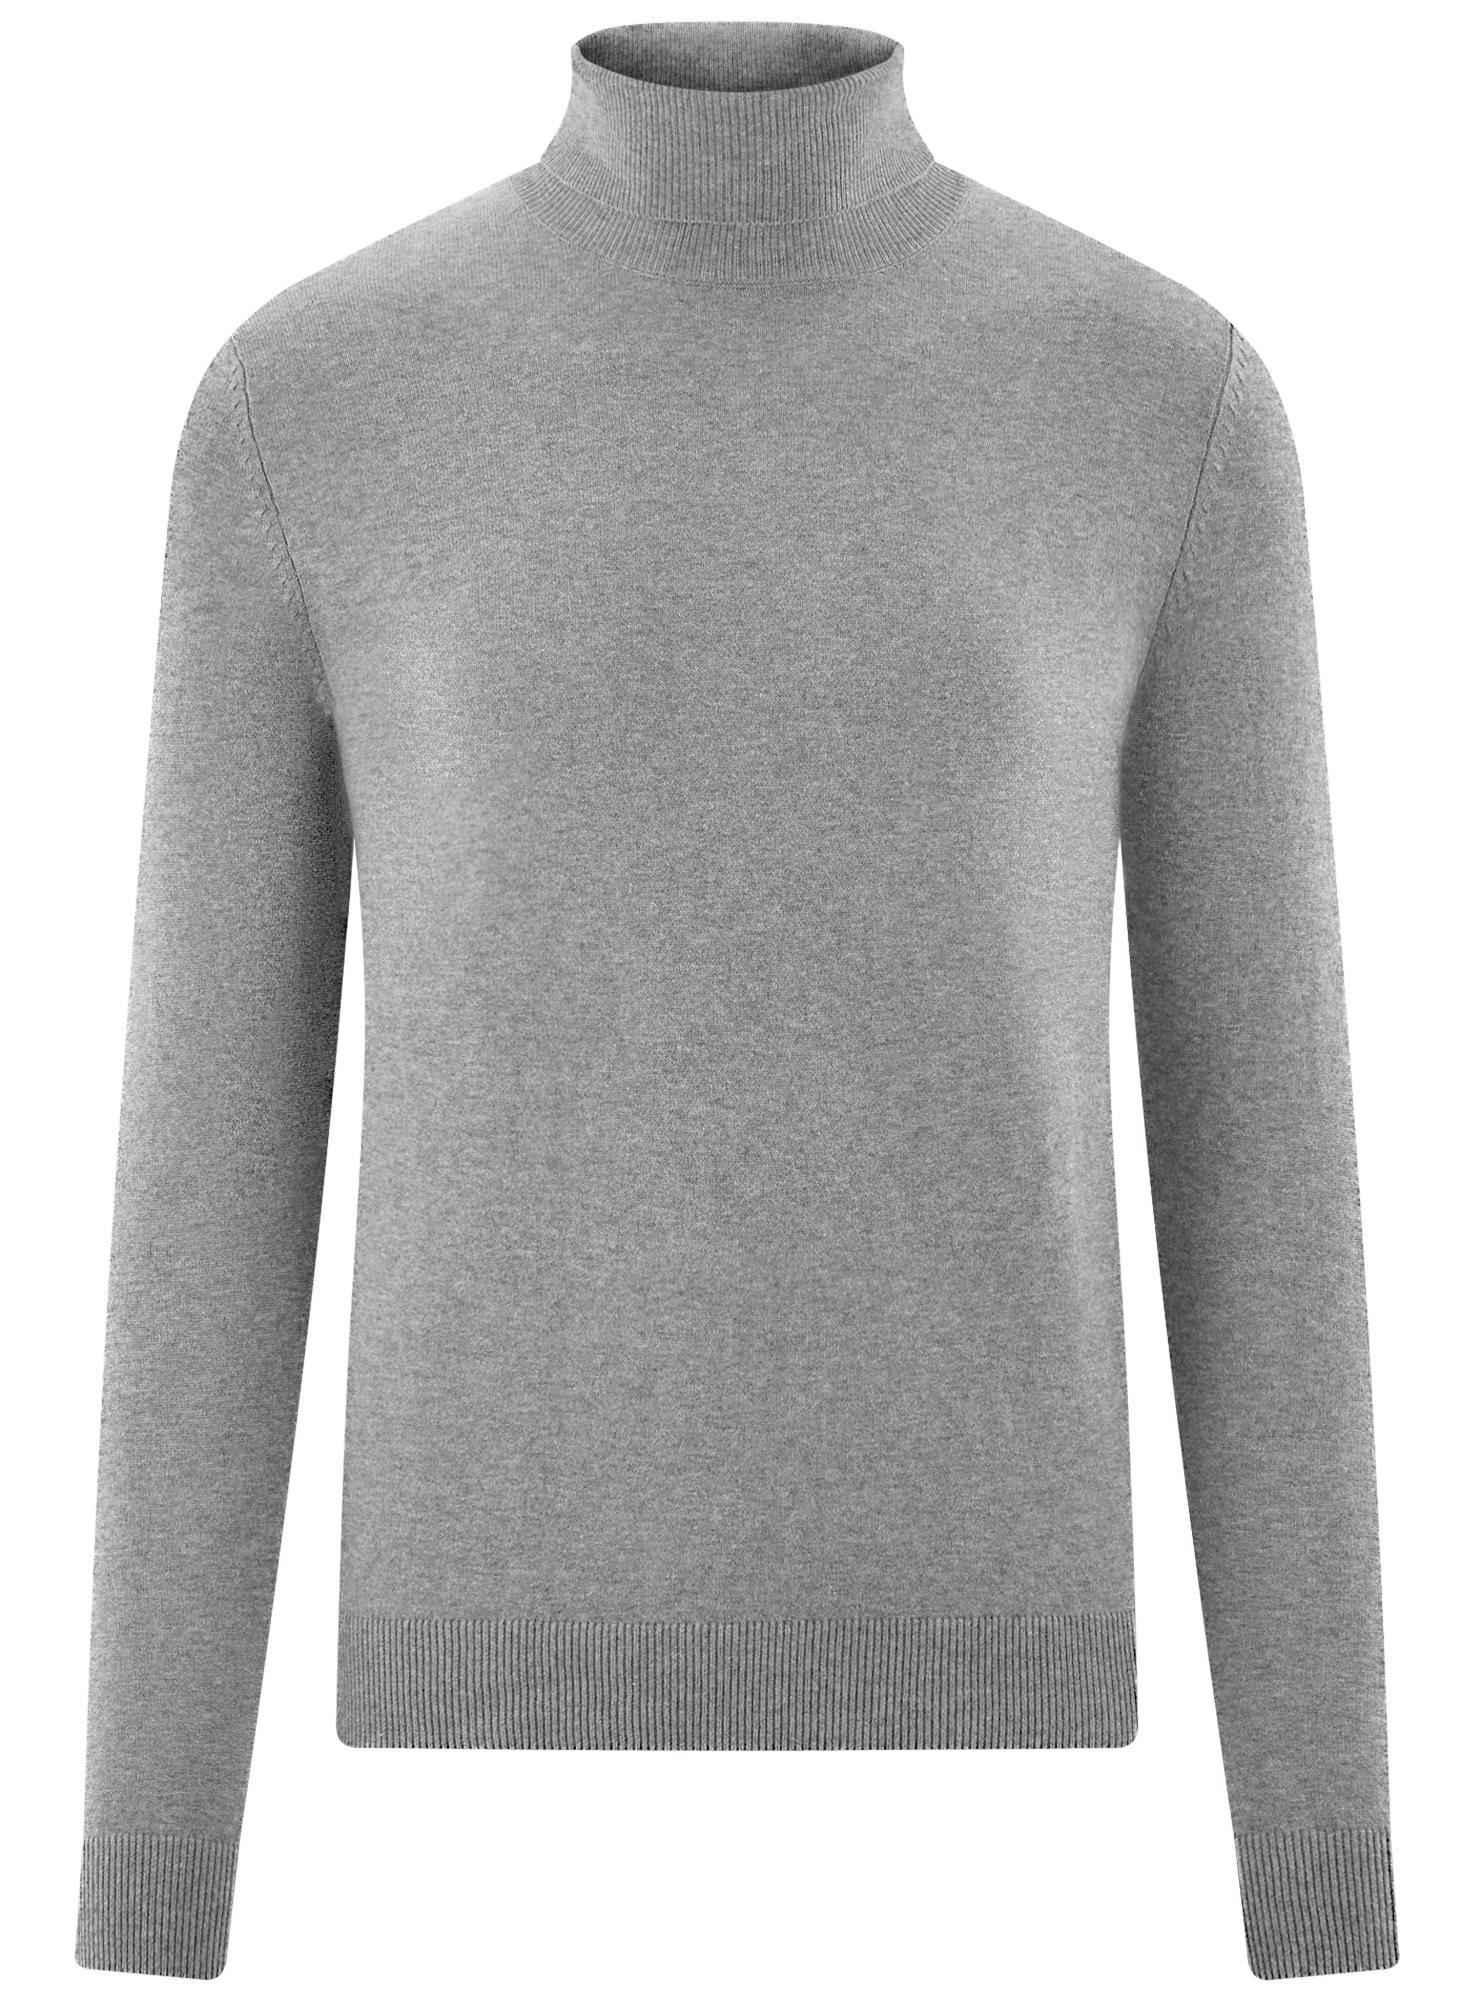 Свитер базовый из хлопка oodji для мужчины (серый), 4B312003M-1/34390N/2301M